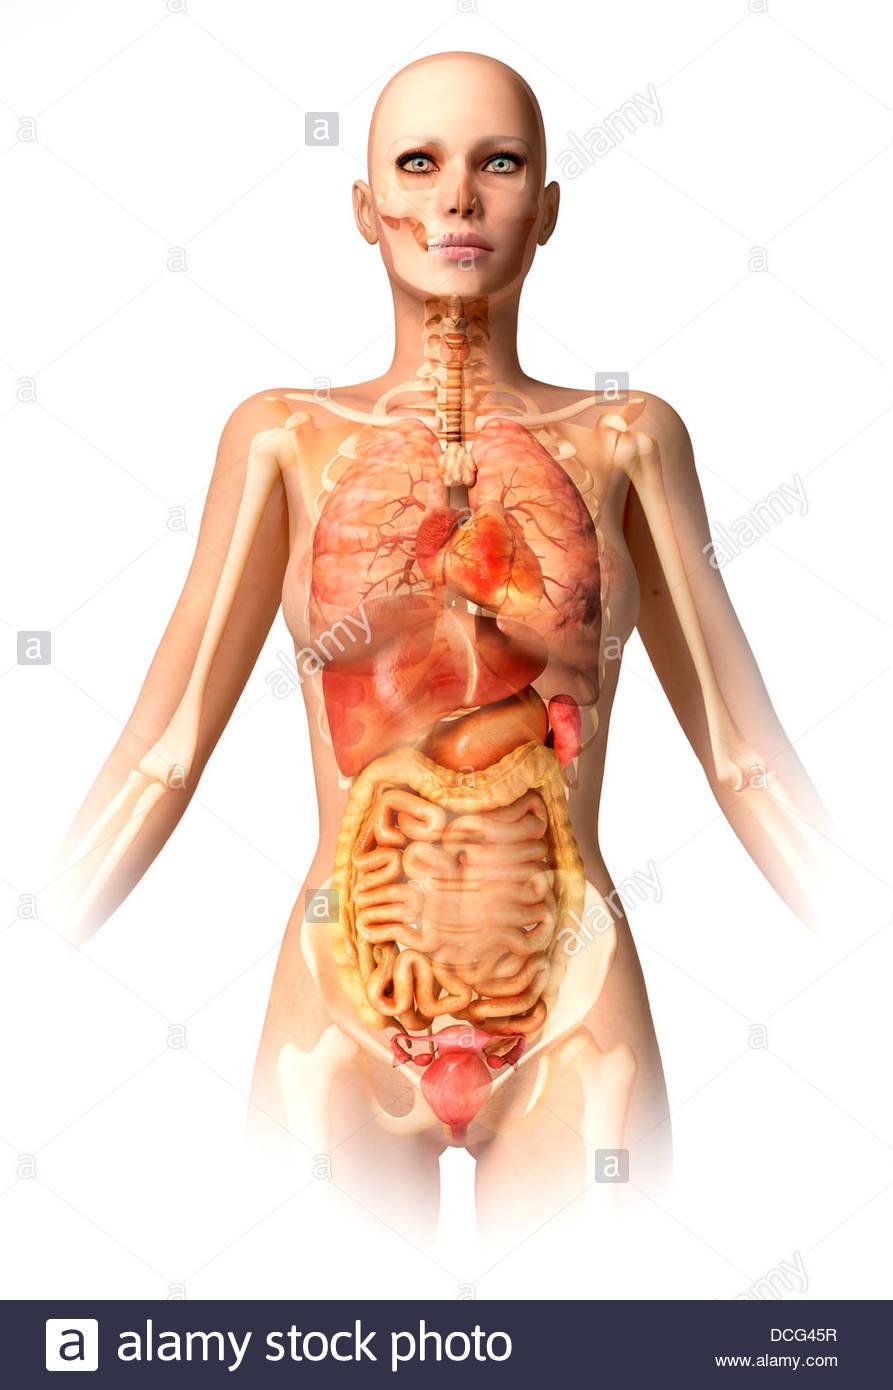 Anatomy of female body with bone skeleton and all internal organs ...